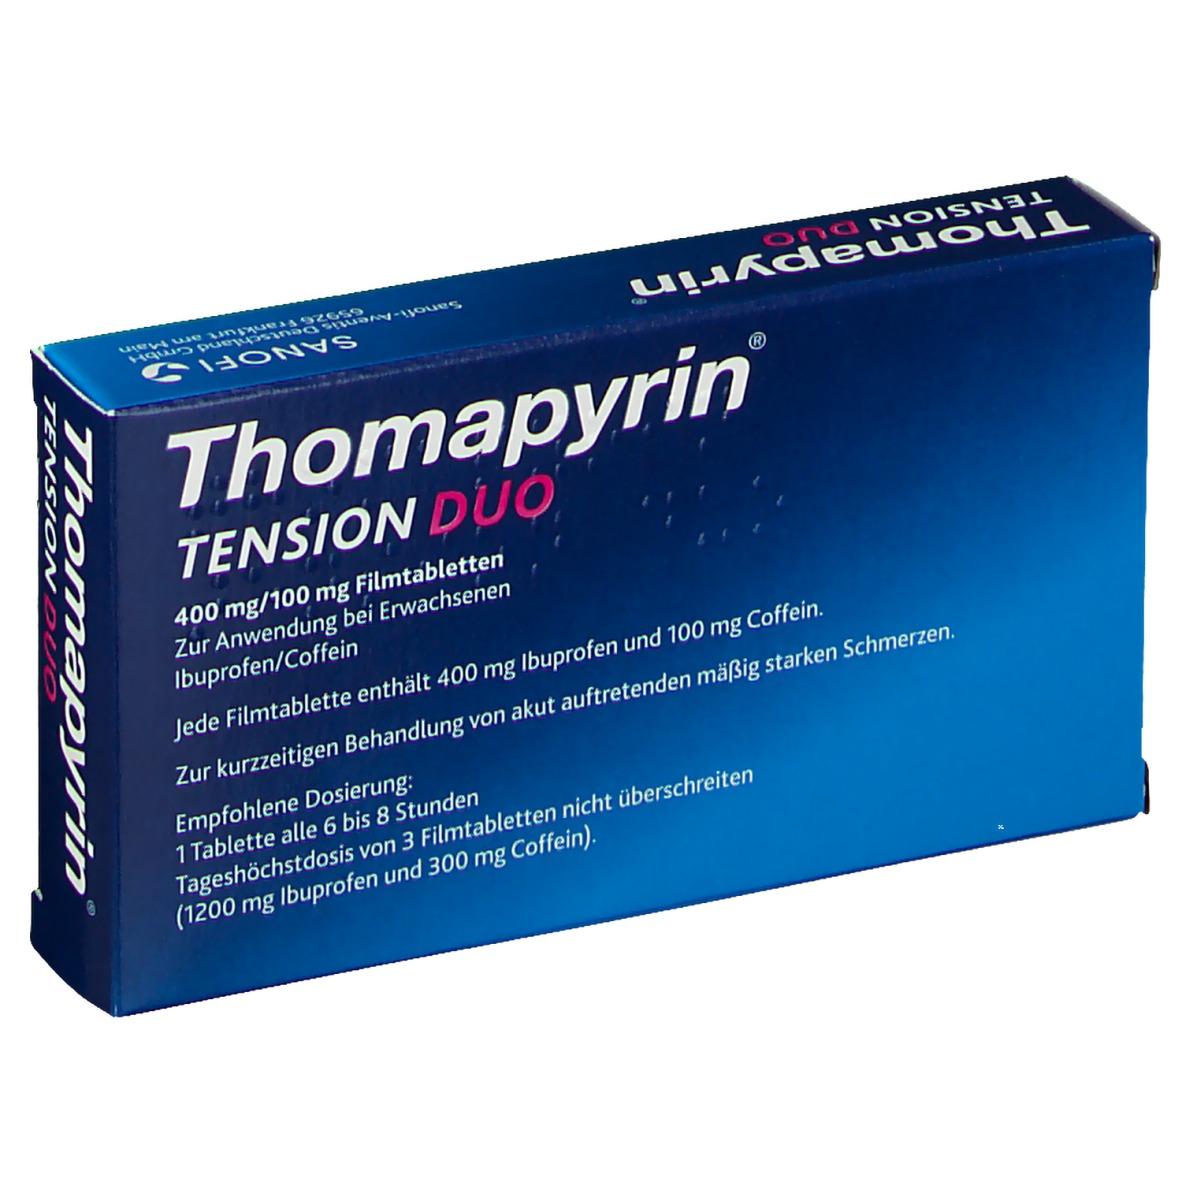 Thomapyrin tension duo